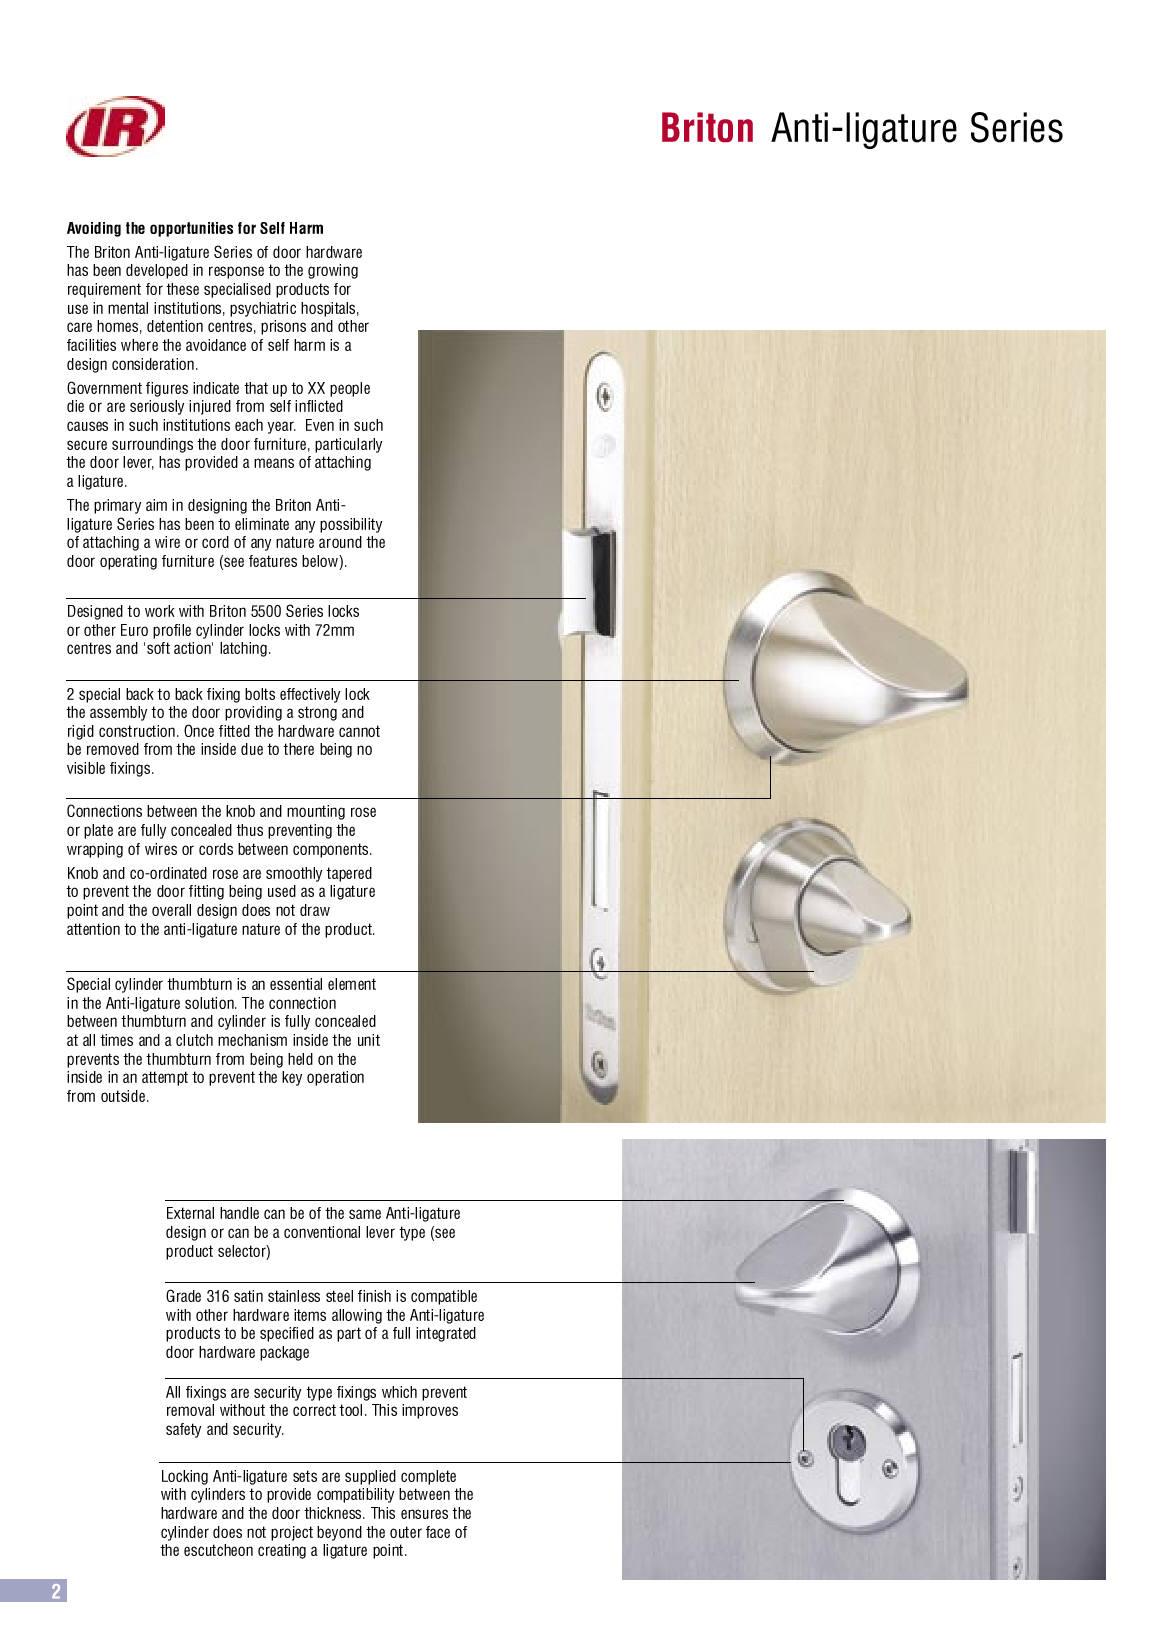 AFS stock a large range of high quality anti ligature locks